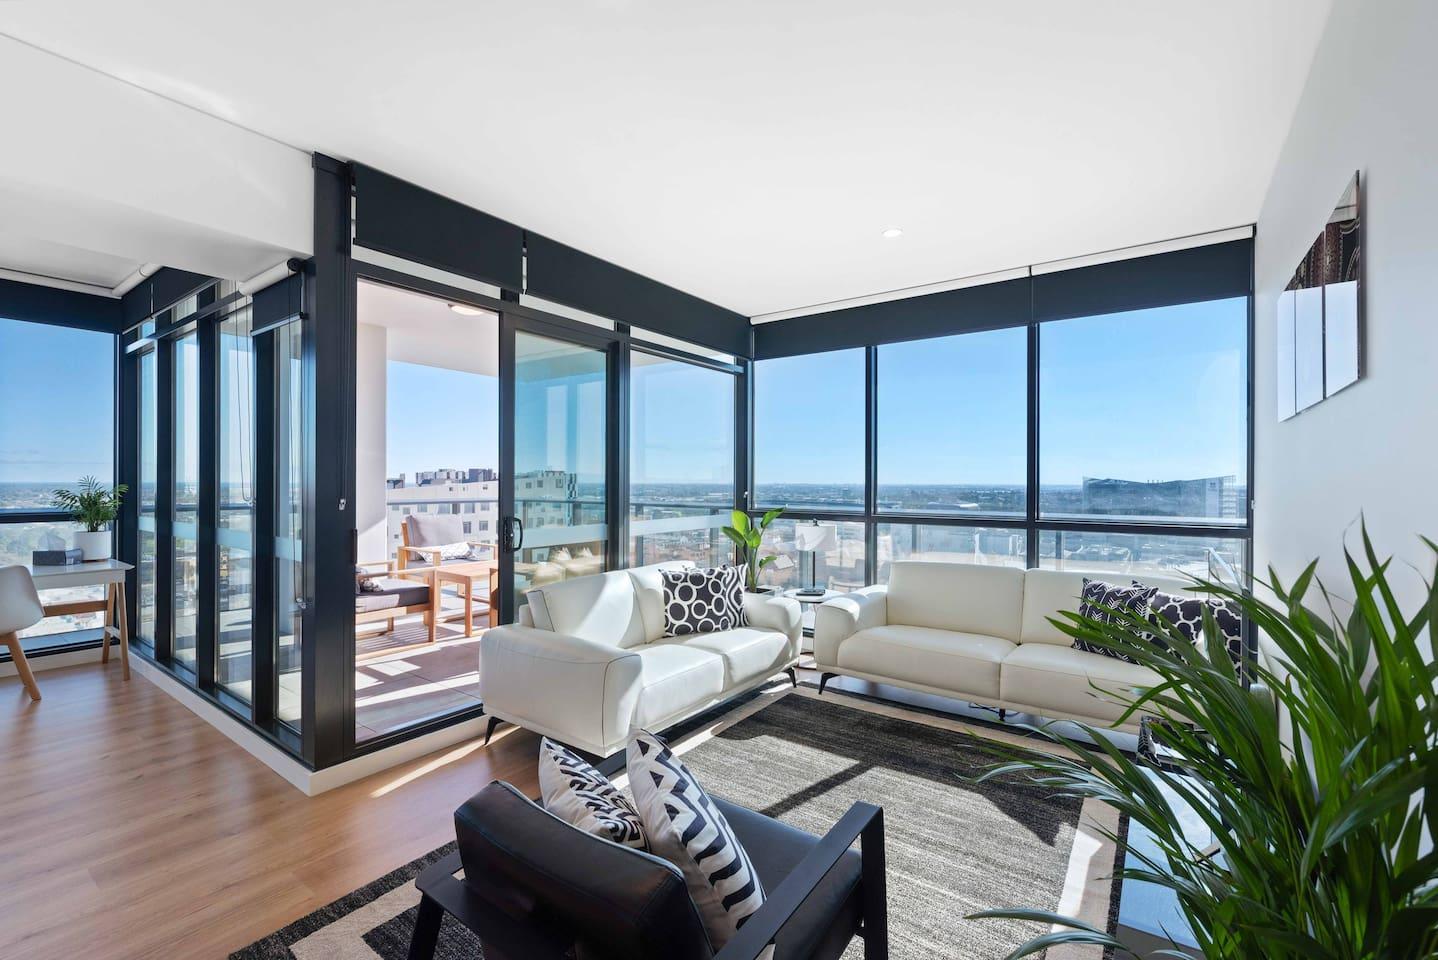 Beautiful views and light on modern decor.